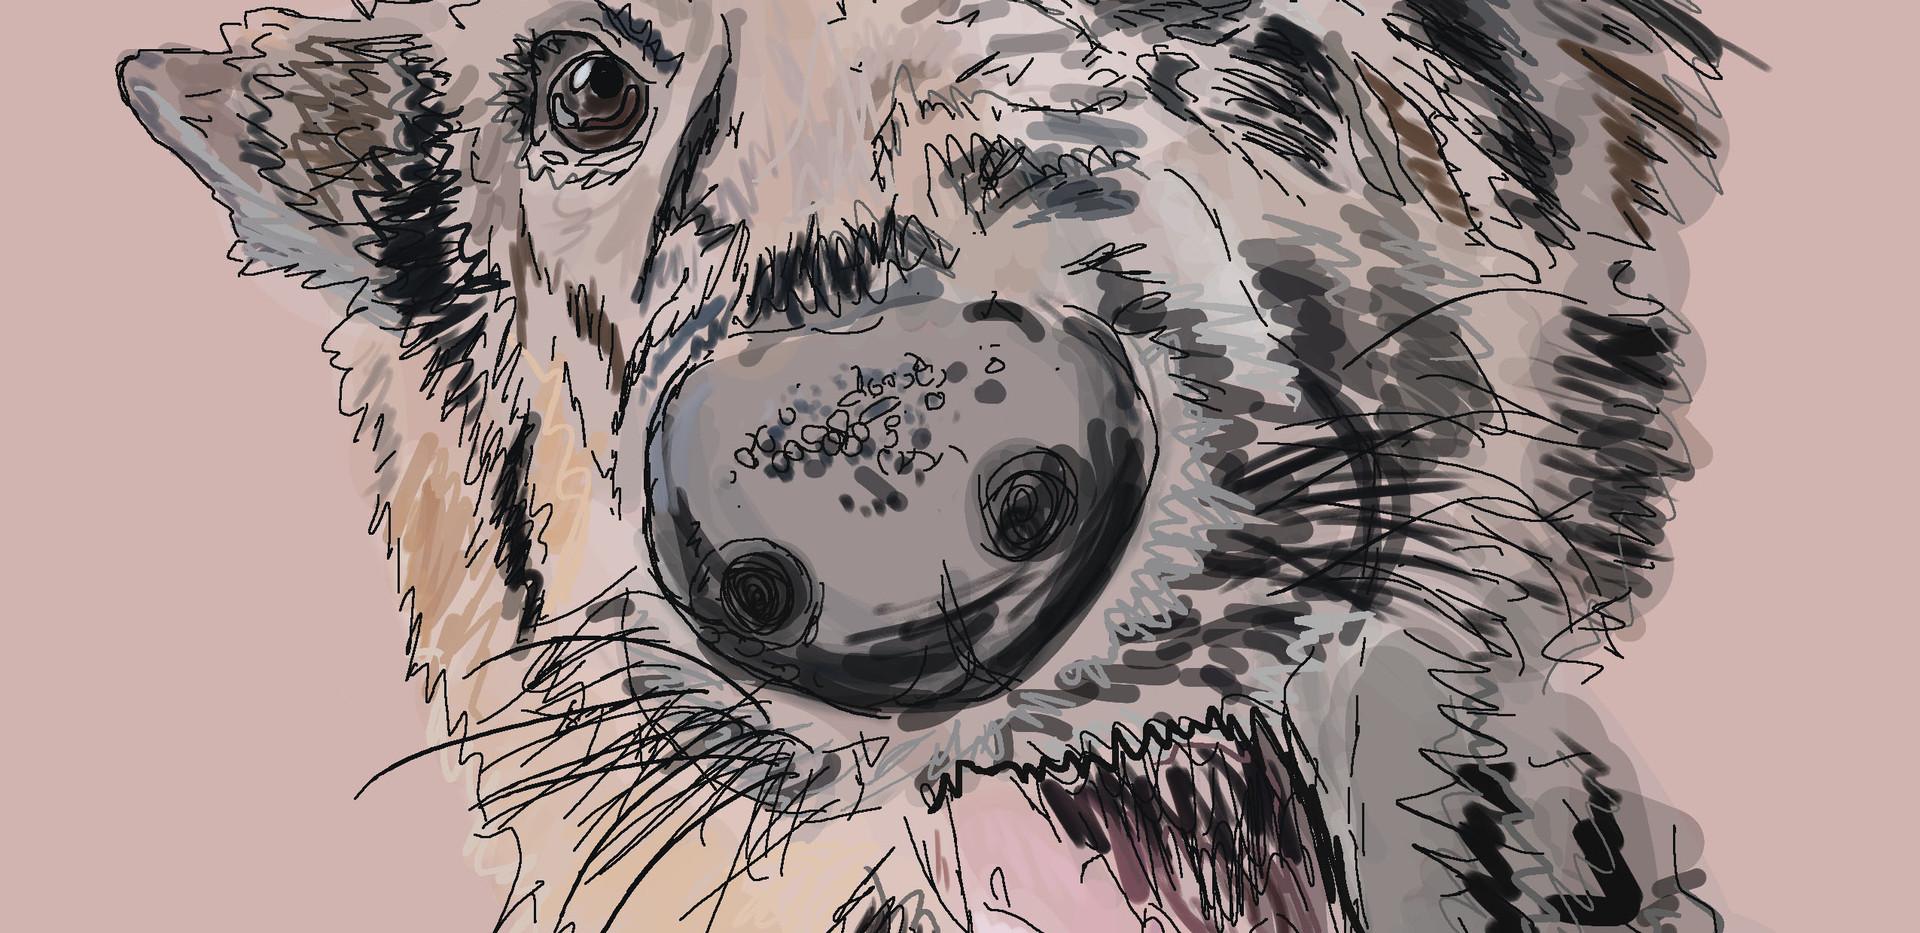 Hanna R- Ruby the Dog Illustration